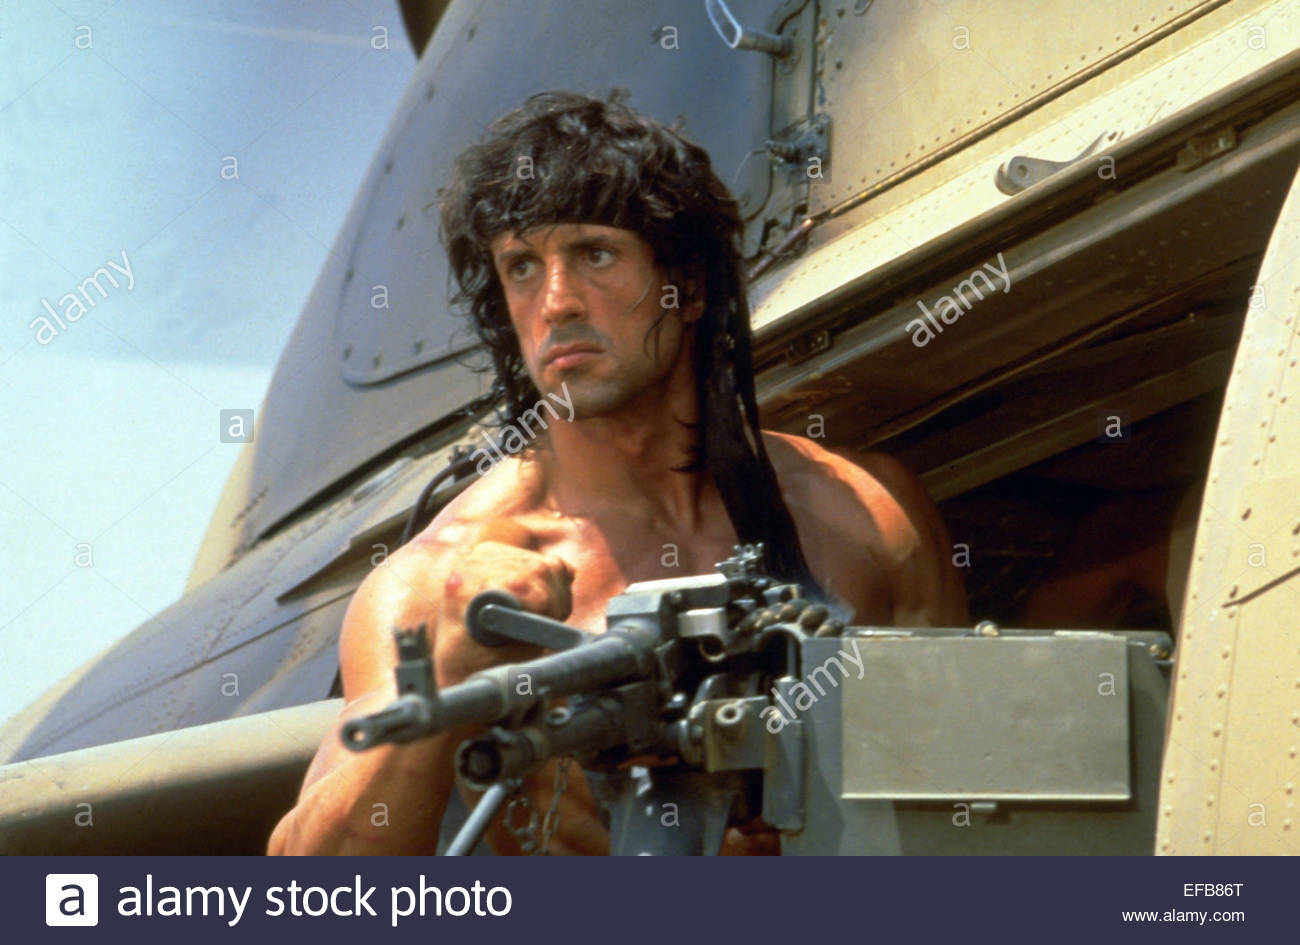 Rambo Iii Wallpapers Movie Hq Rambo Iii Pictures 4k Wallpapers 2019